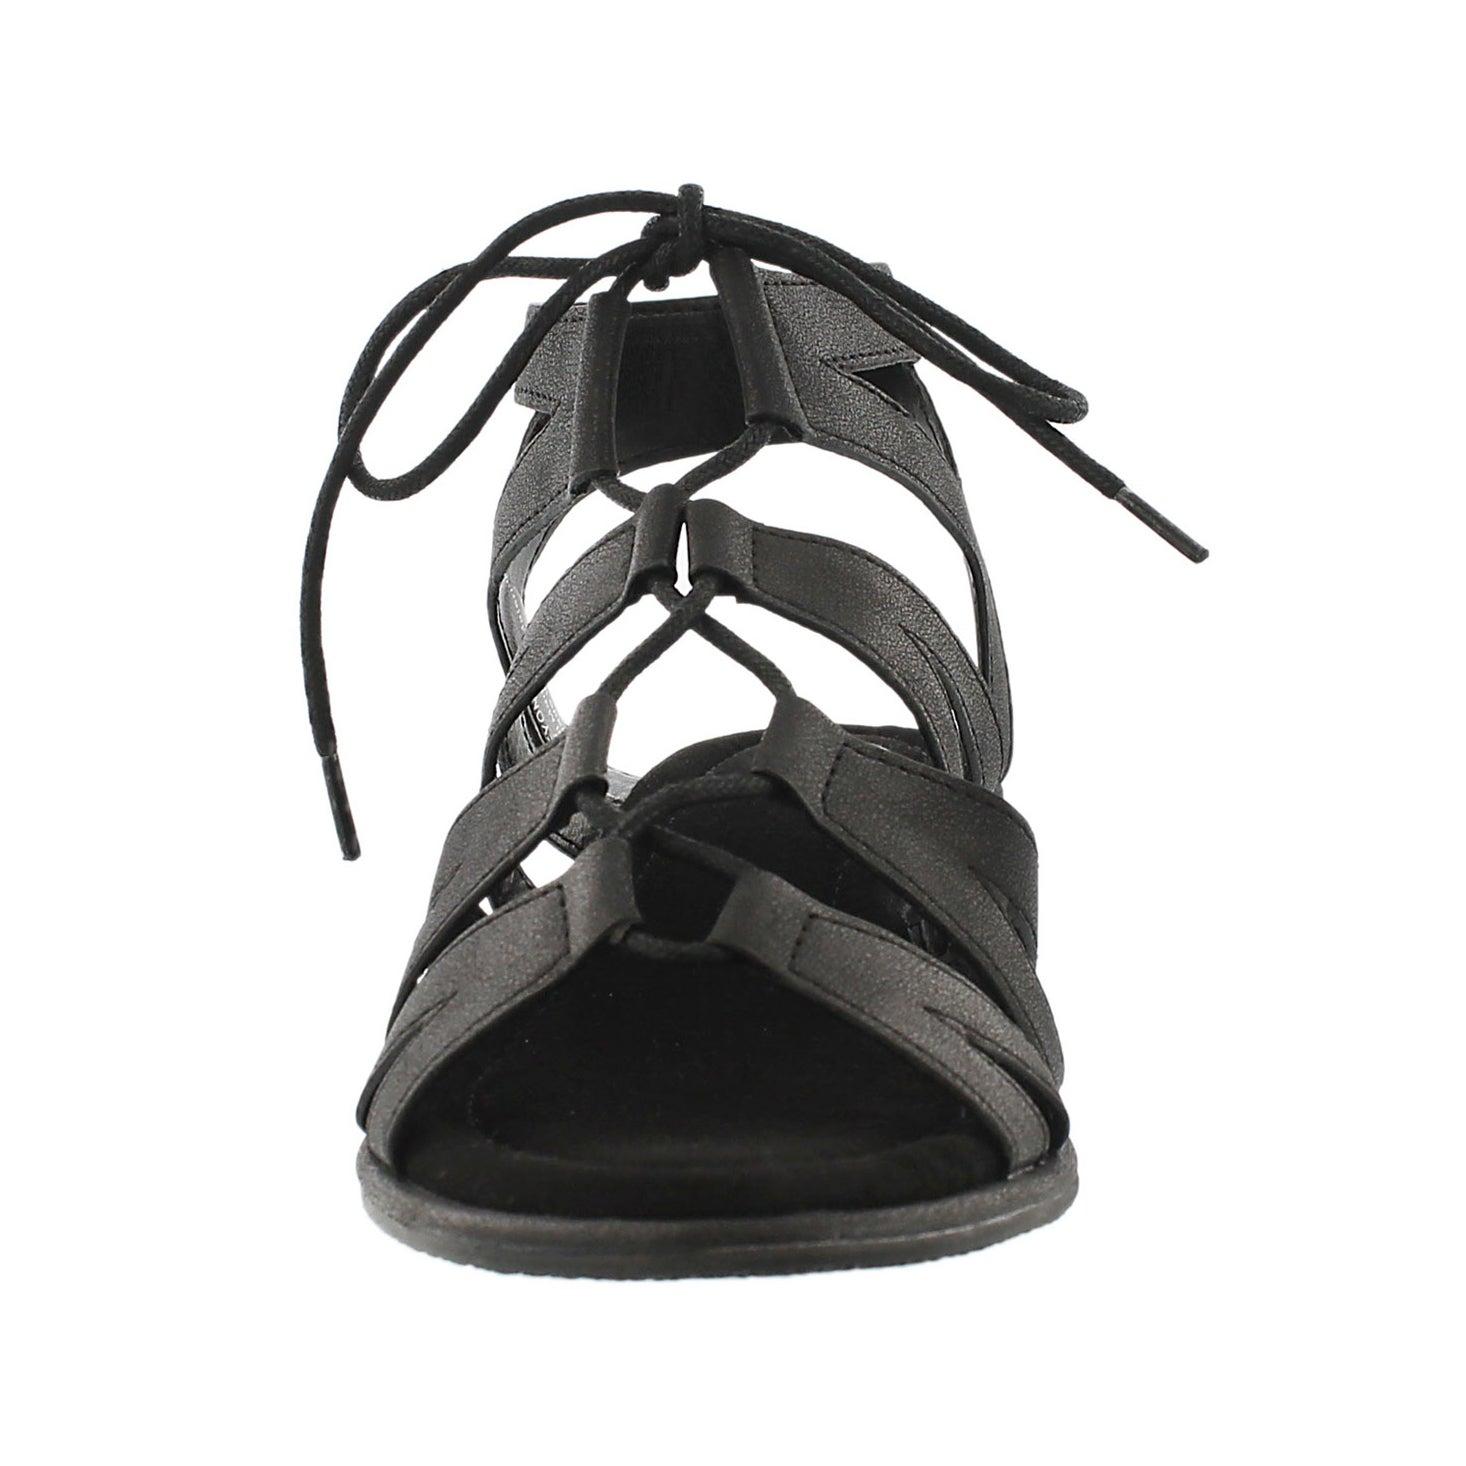 Sandale gladiateur Beyonce, noir, femmes